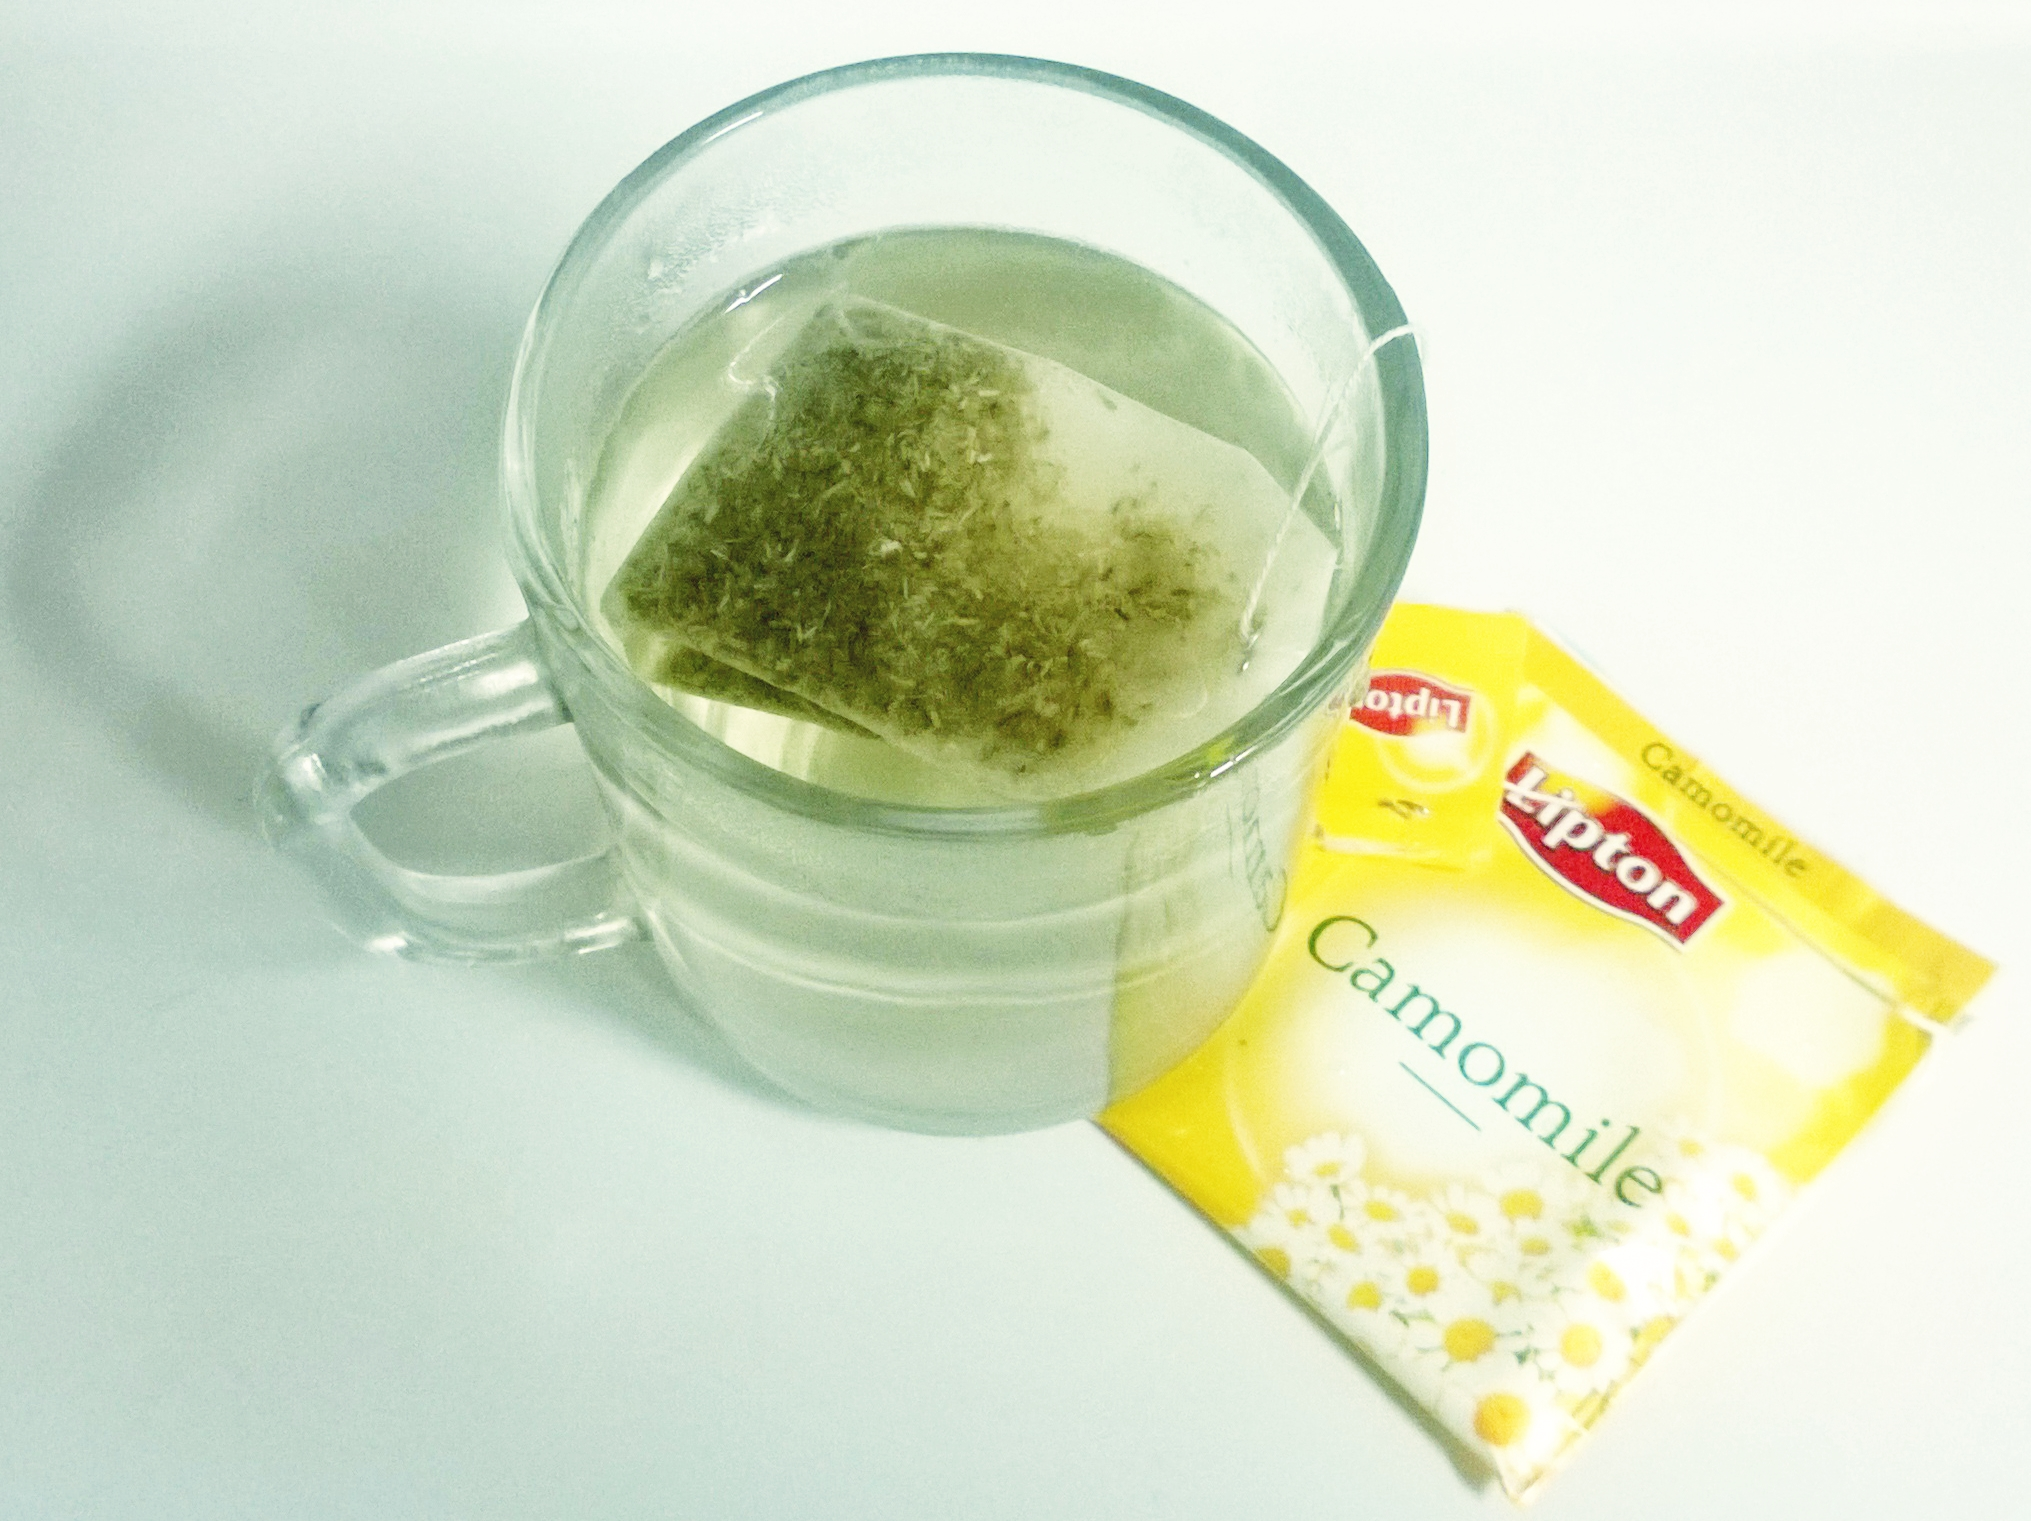 Pics For Gt Chamomile Tea Lipton